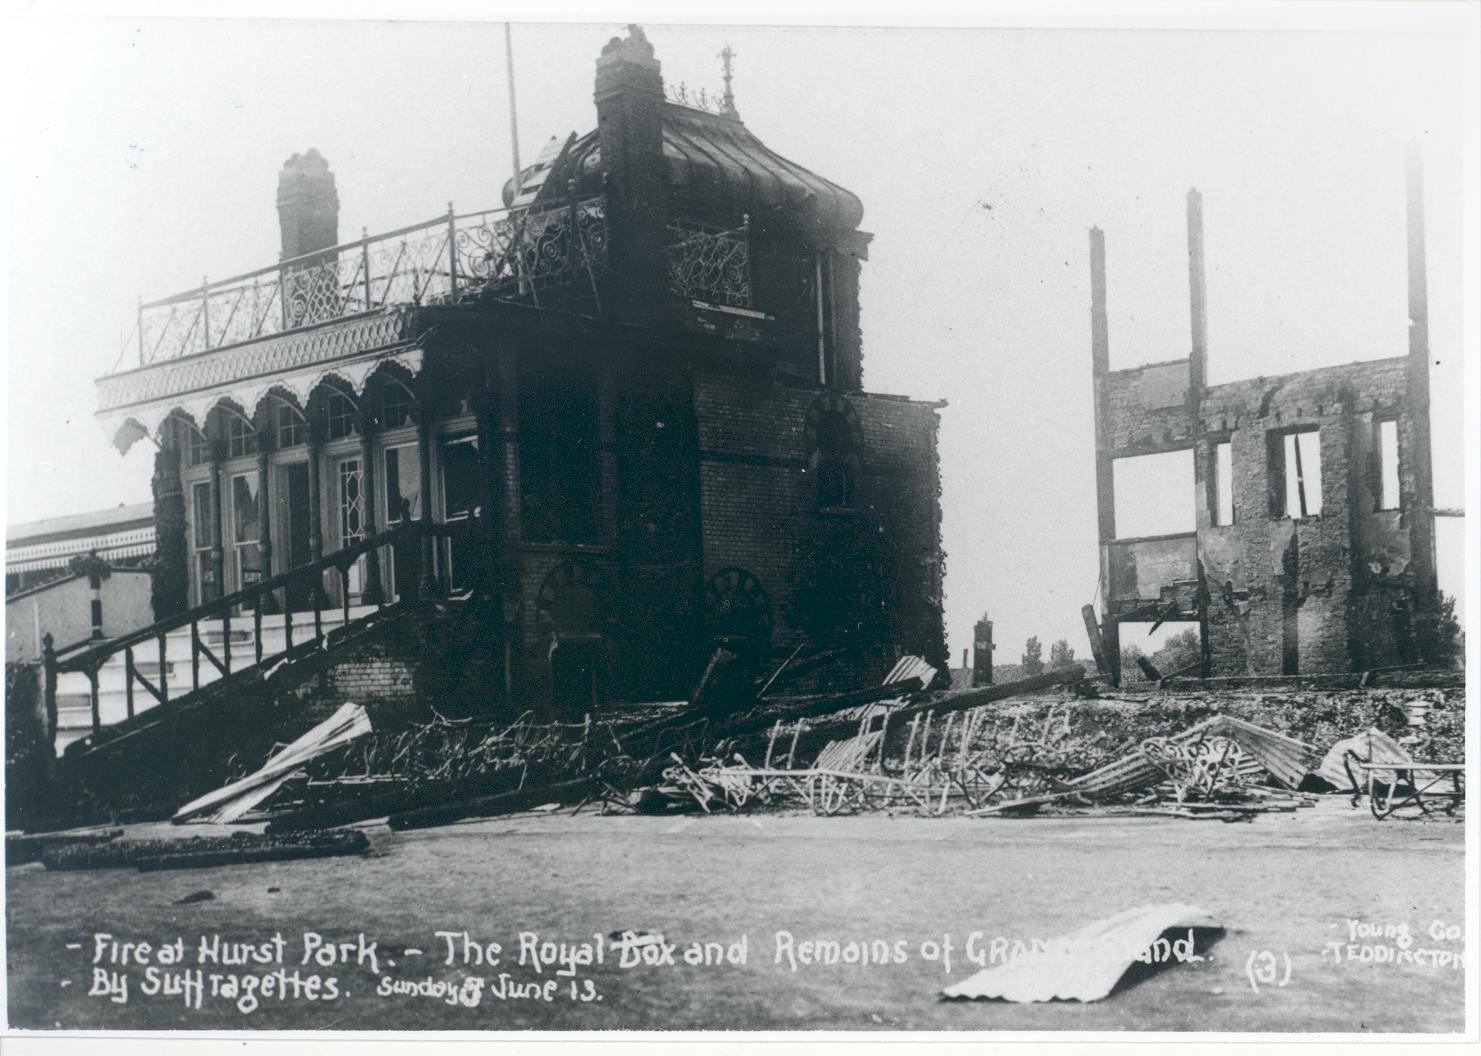 the remains of Hurst Park Grandstand after Suffragette arson, June 1913.